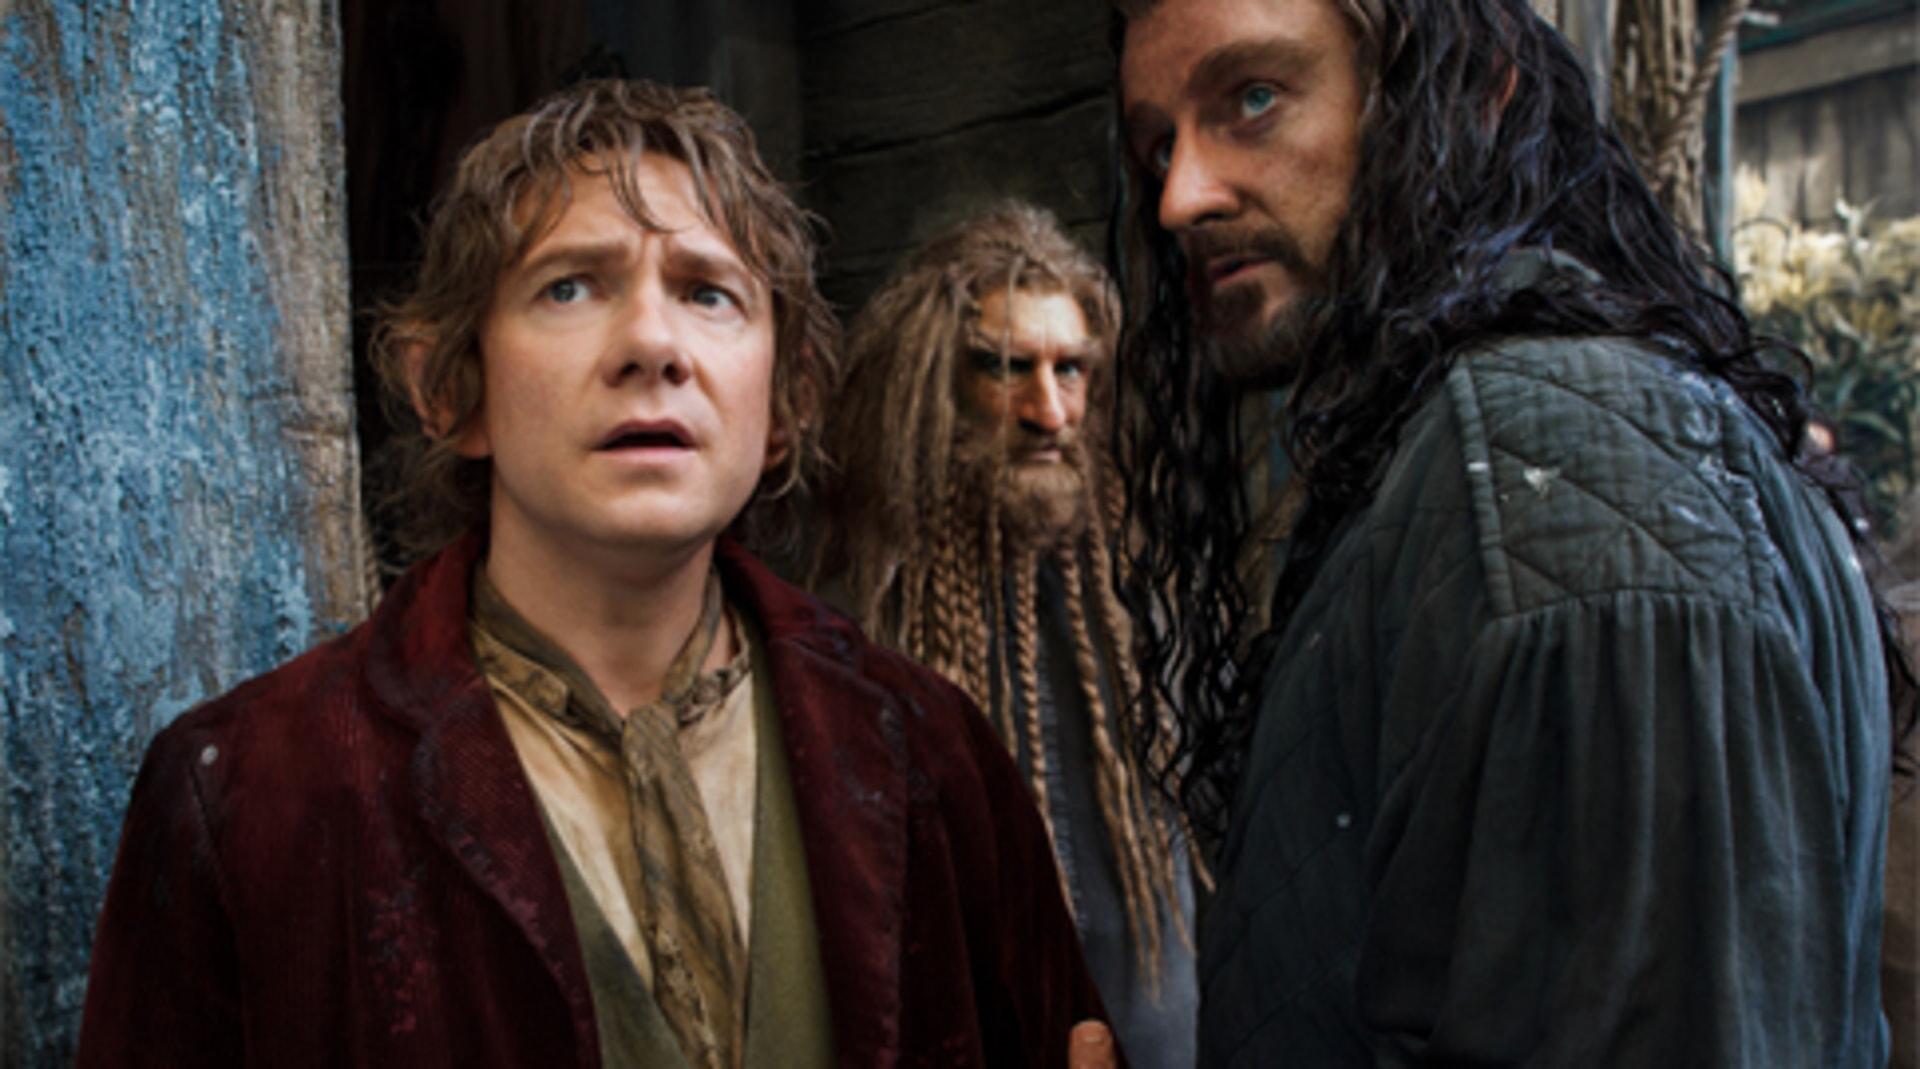 The Hobbit: The Desolation of Smaug - Image 40